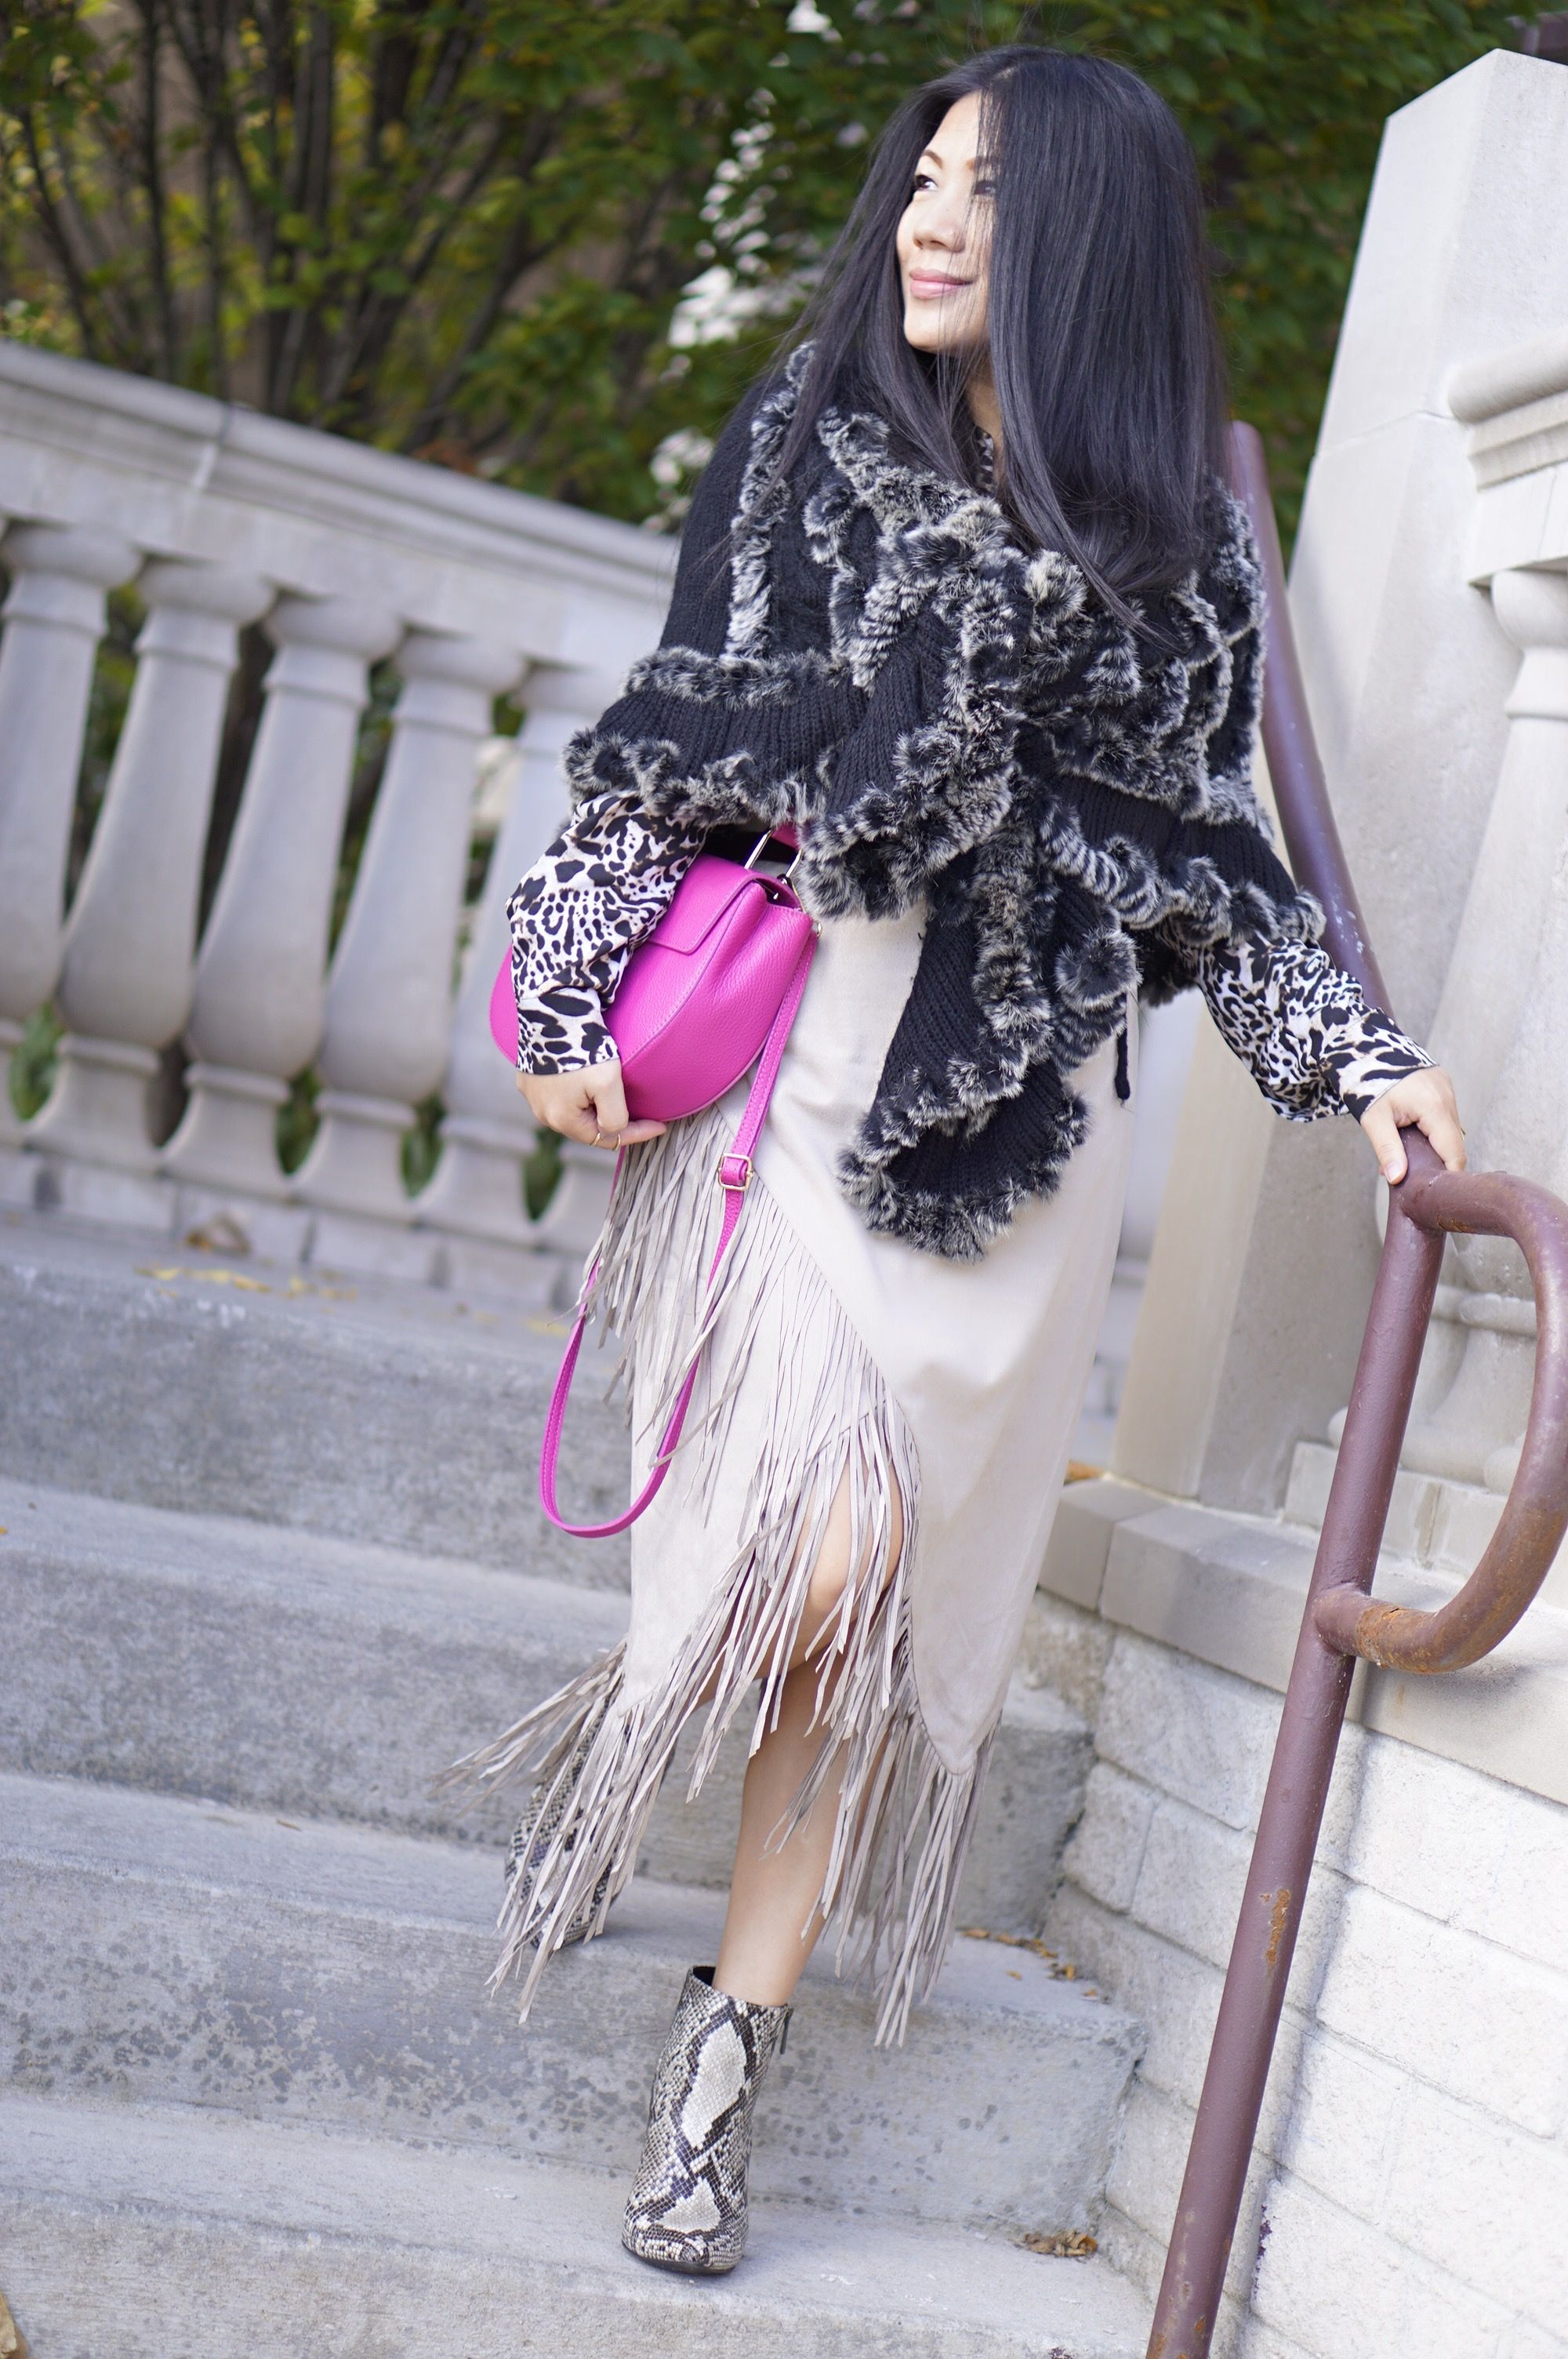 fall street style beige fringe skirt+fur sweater cape+pink bag+snake skin booties